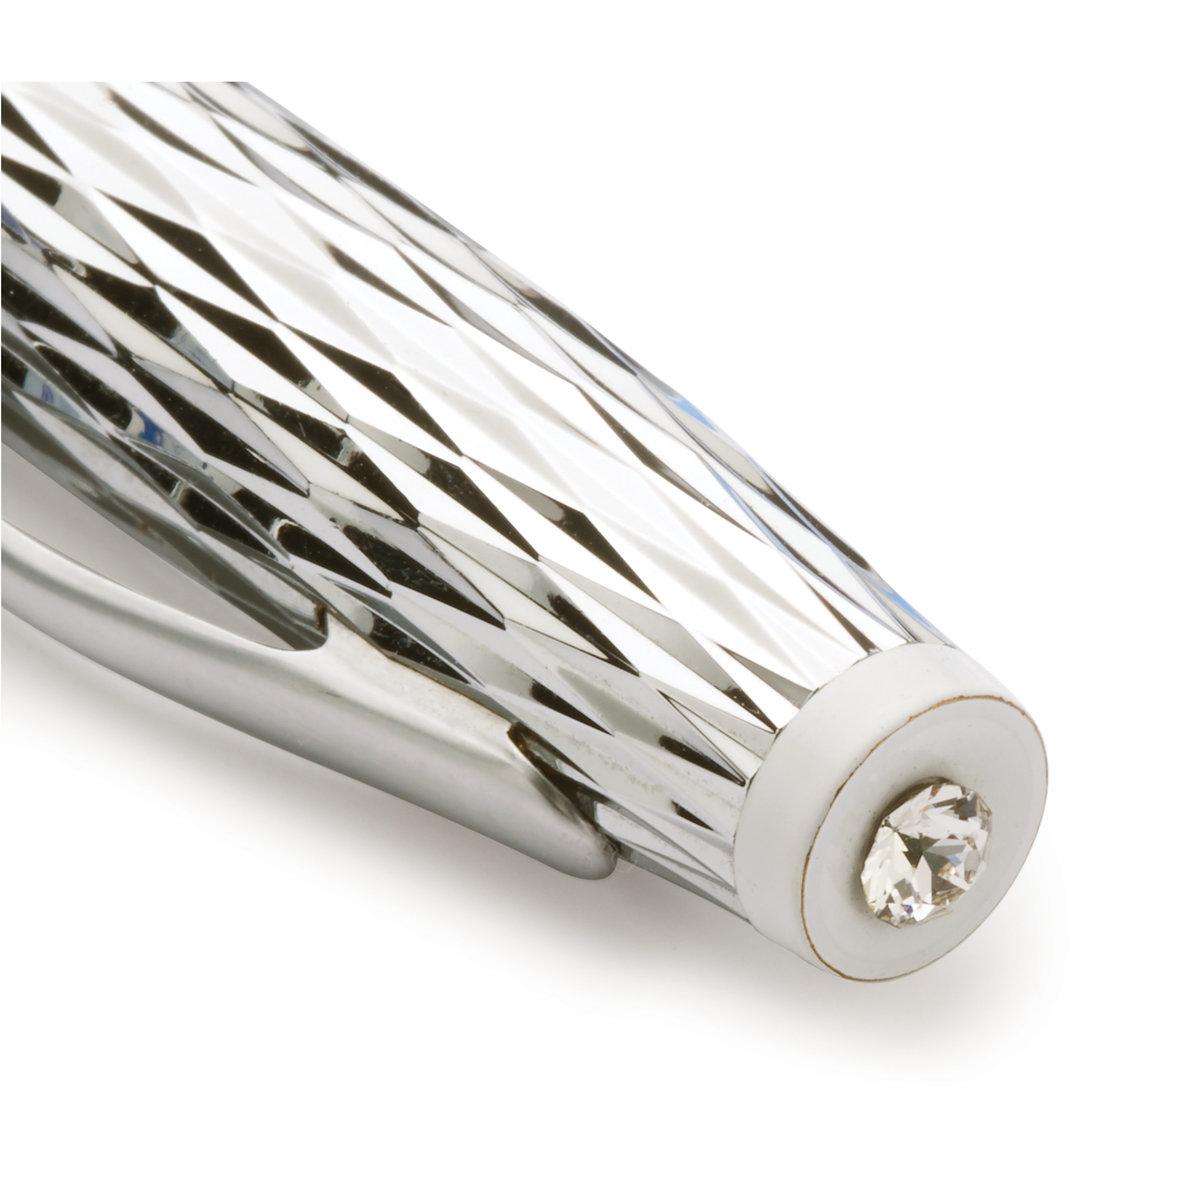 View a Larger Image of Too Chic Twist Pen Kit - Chrome & Satin Chrome w/White Centerband